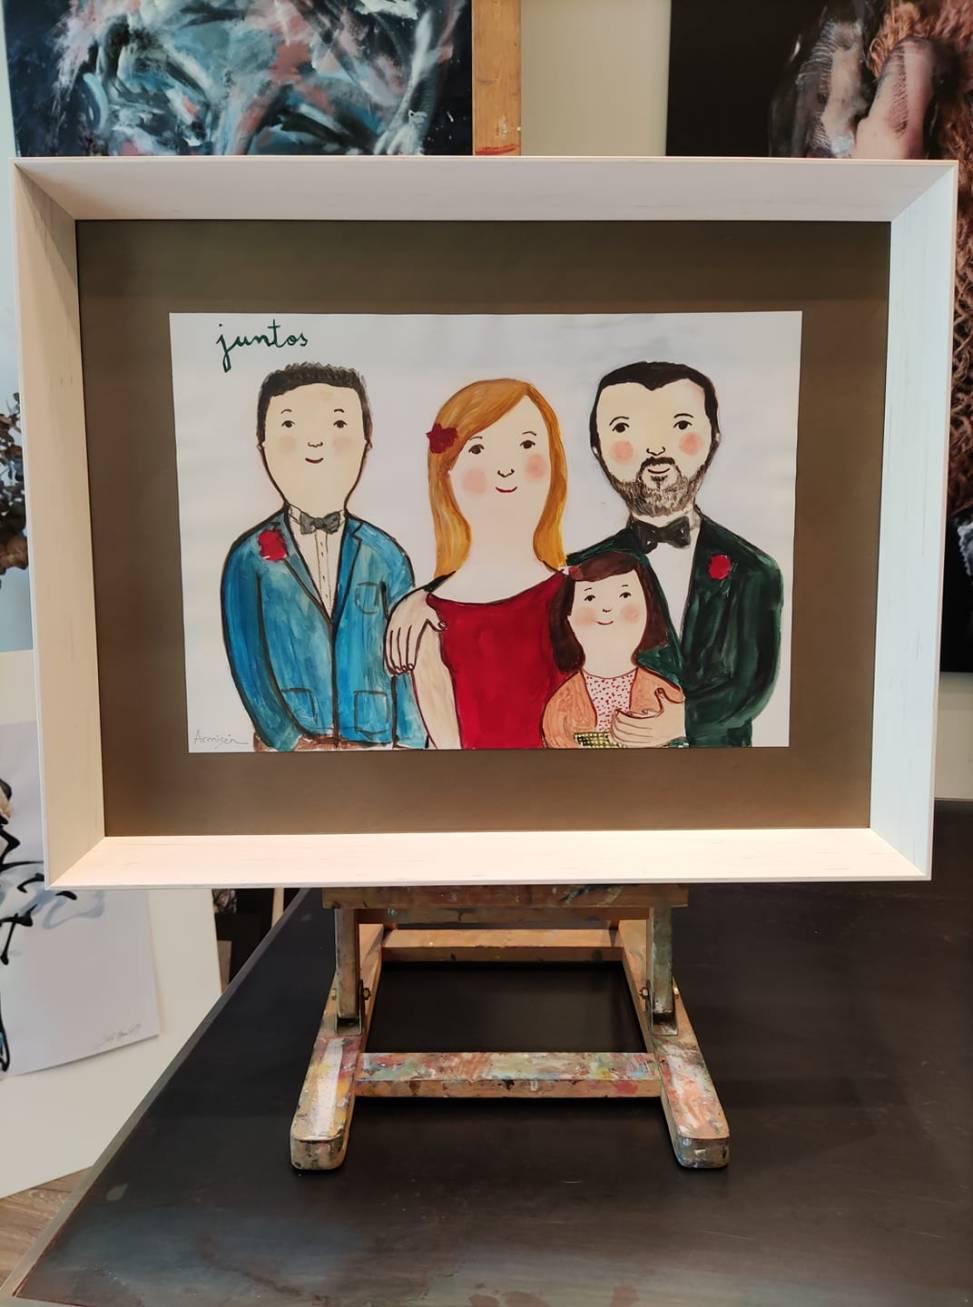 Un simpático retrato de familia, autora: Eva Armisen